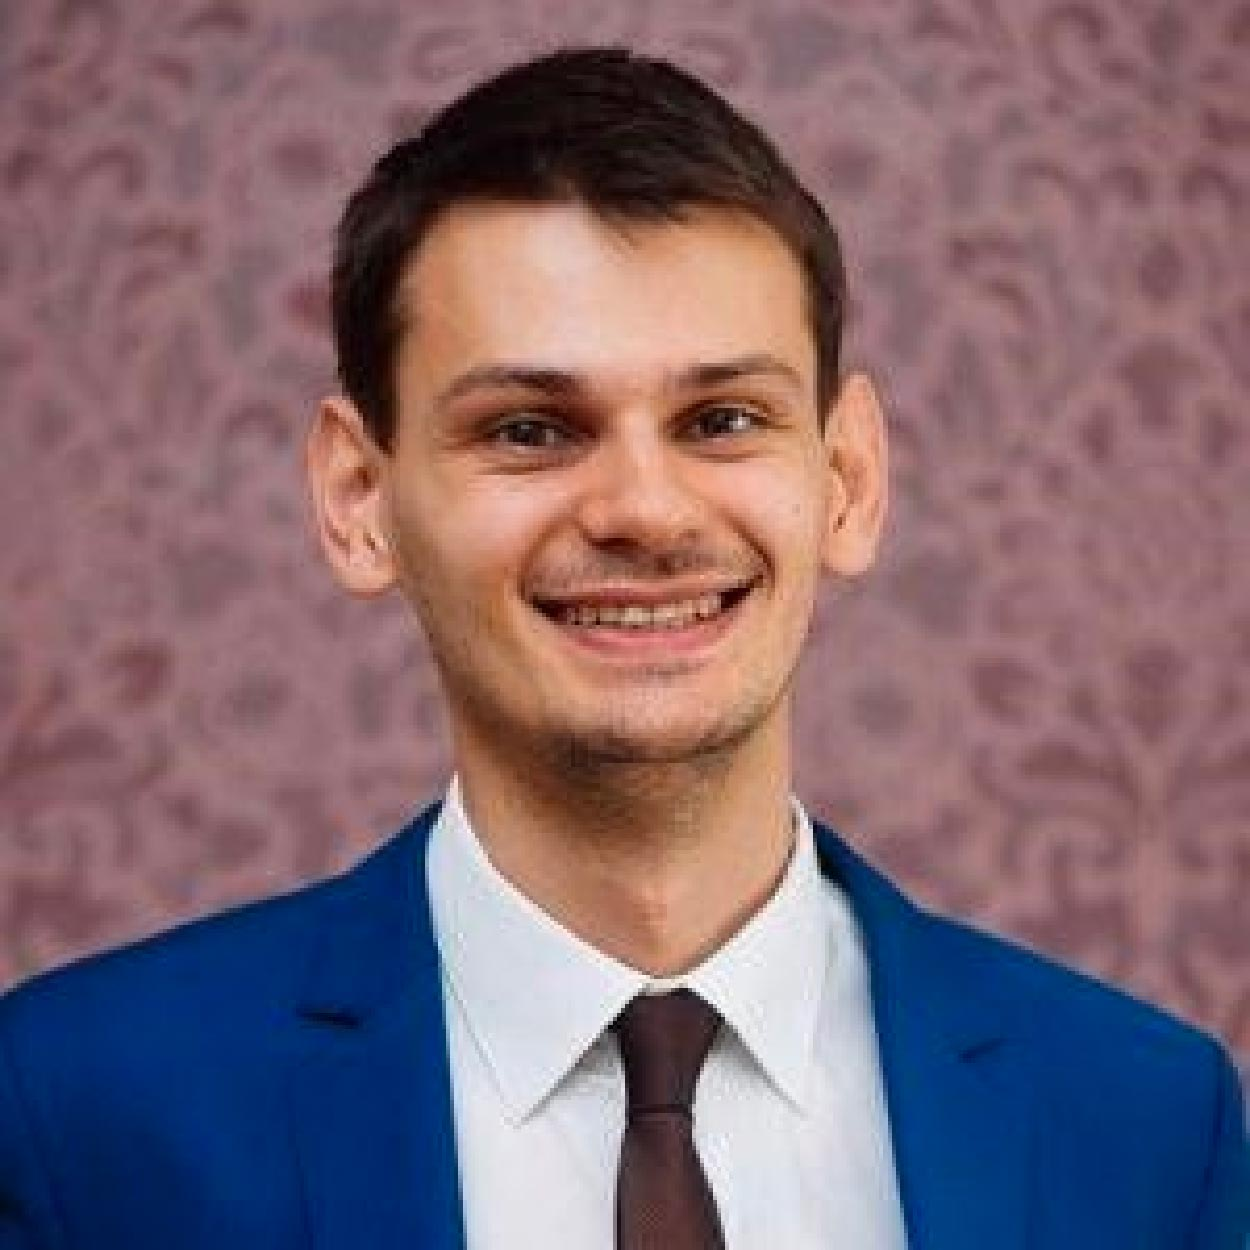 Volodymyr Koman MIT Photonics